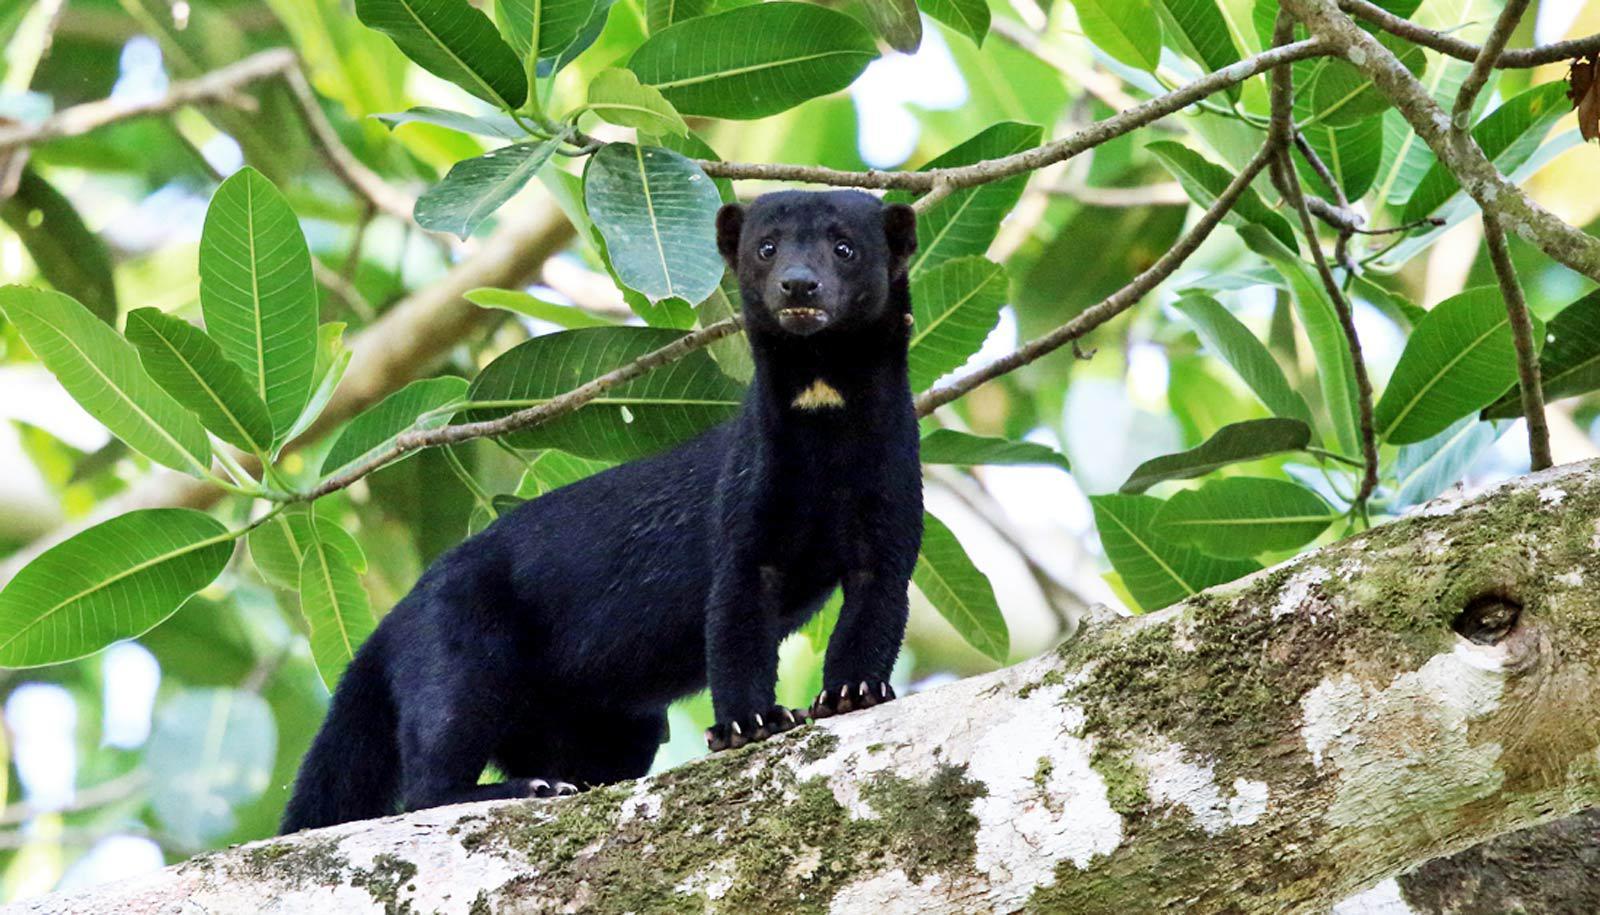 tayra - black weasel-ish creature